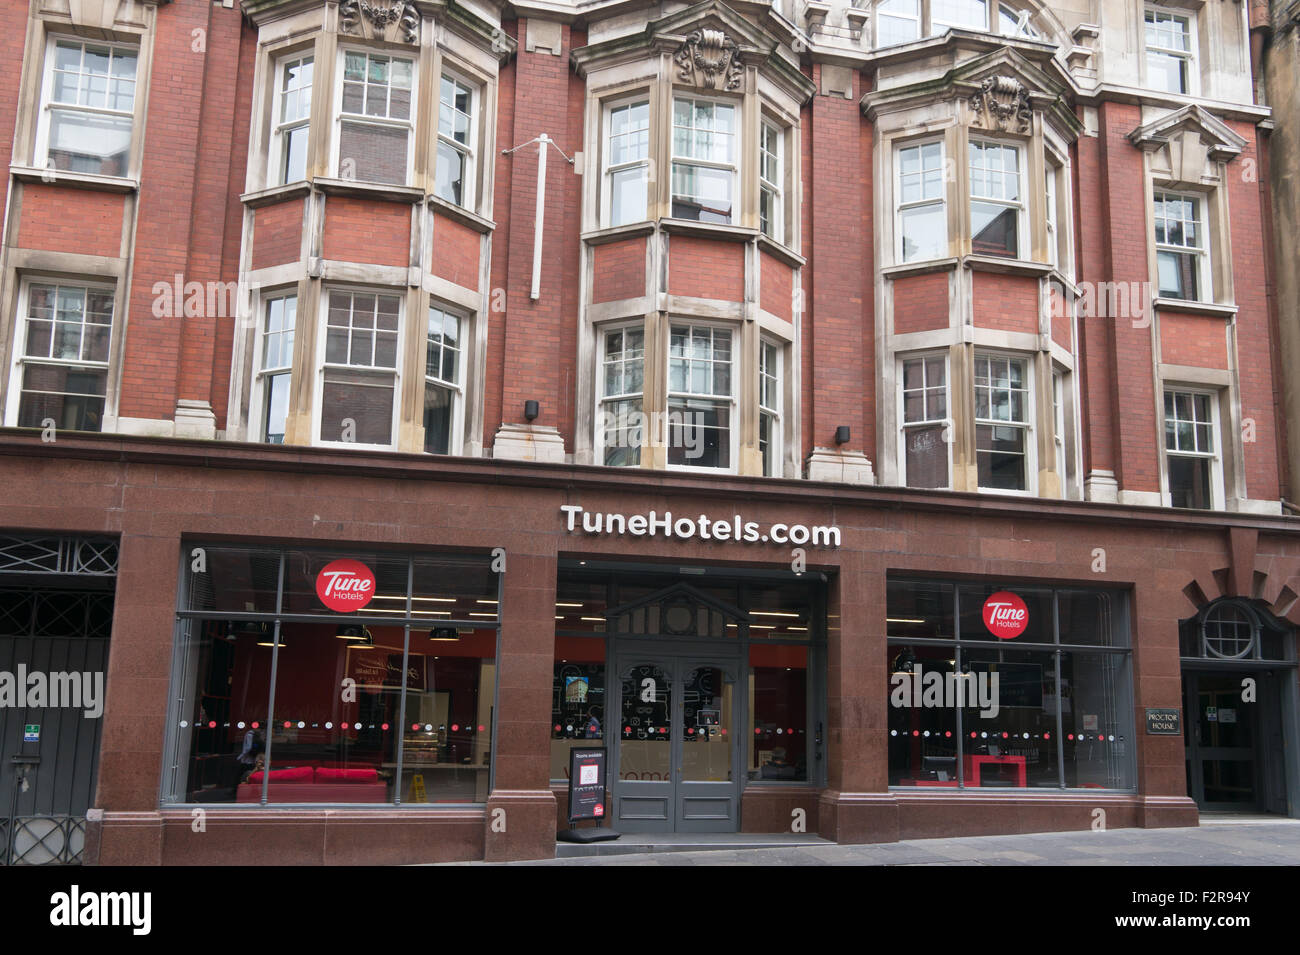 Tune Hotel, Newcastle-upon-Tyne, north east England, UK - Stock Image